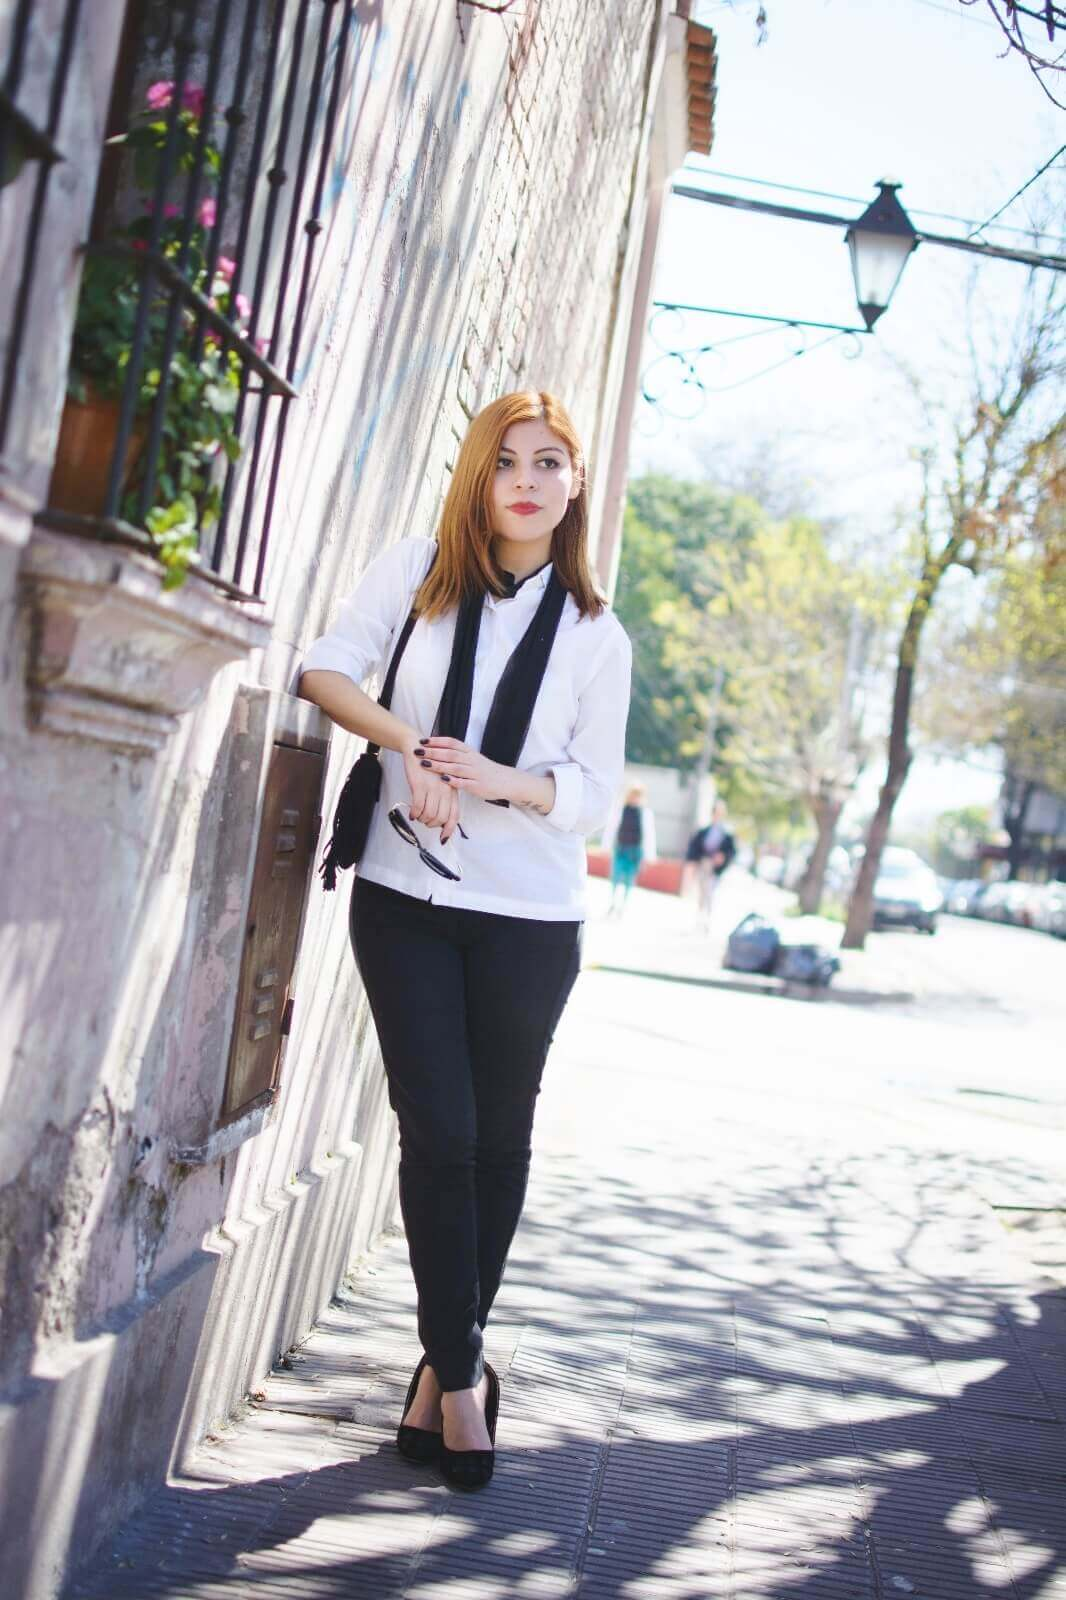 white-shirt-skinny-scarf-black-jeans-zaful-black-suede-shoes-deborah-ferrero-style-by-deb05